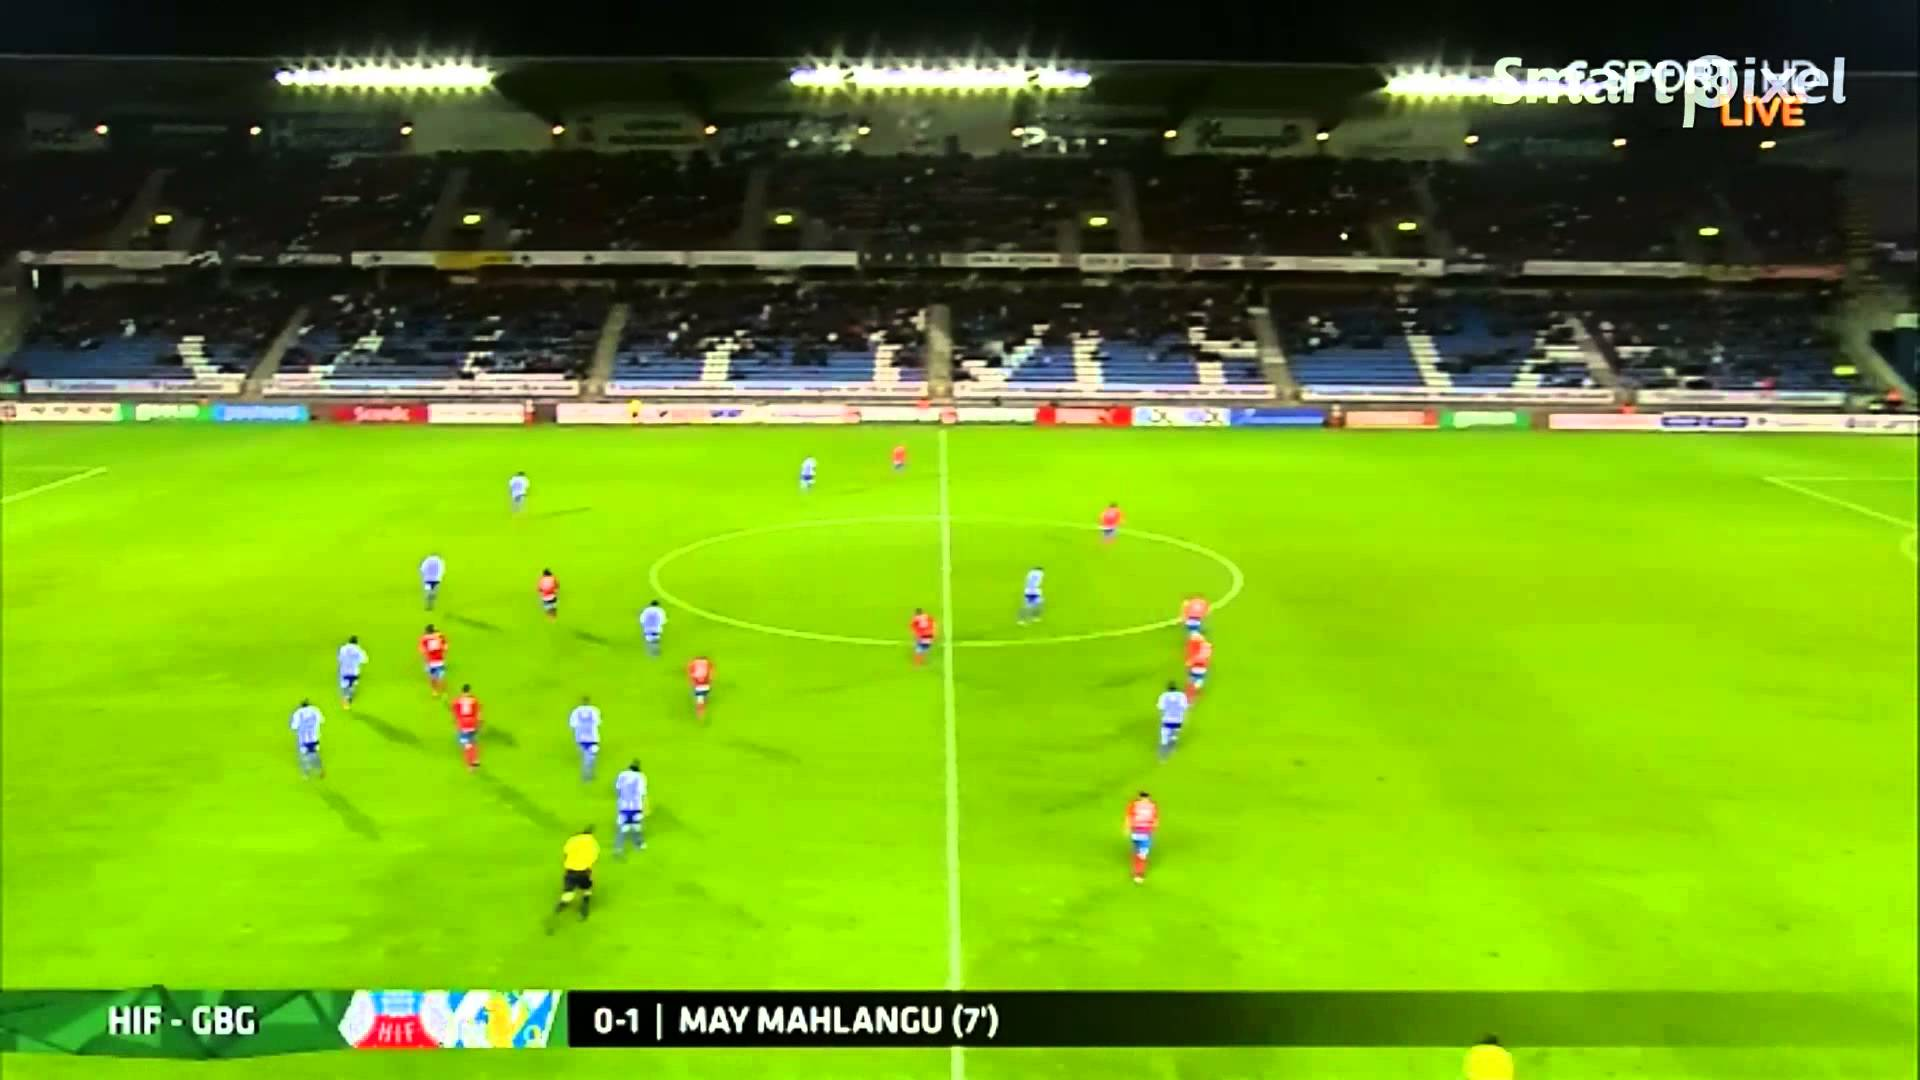 Video: Helsingborgs IF – IFK Göteborg (0-3), Allsvenskan